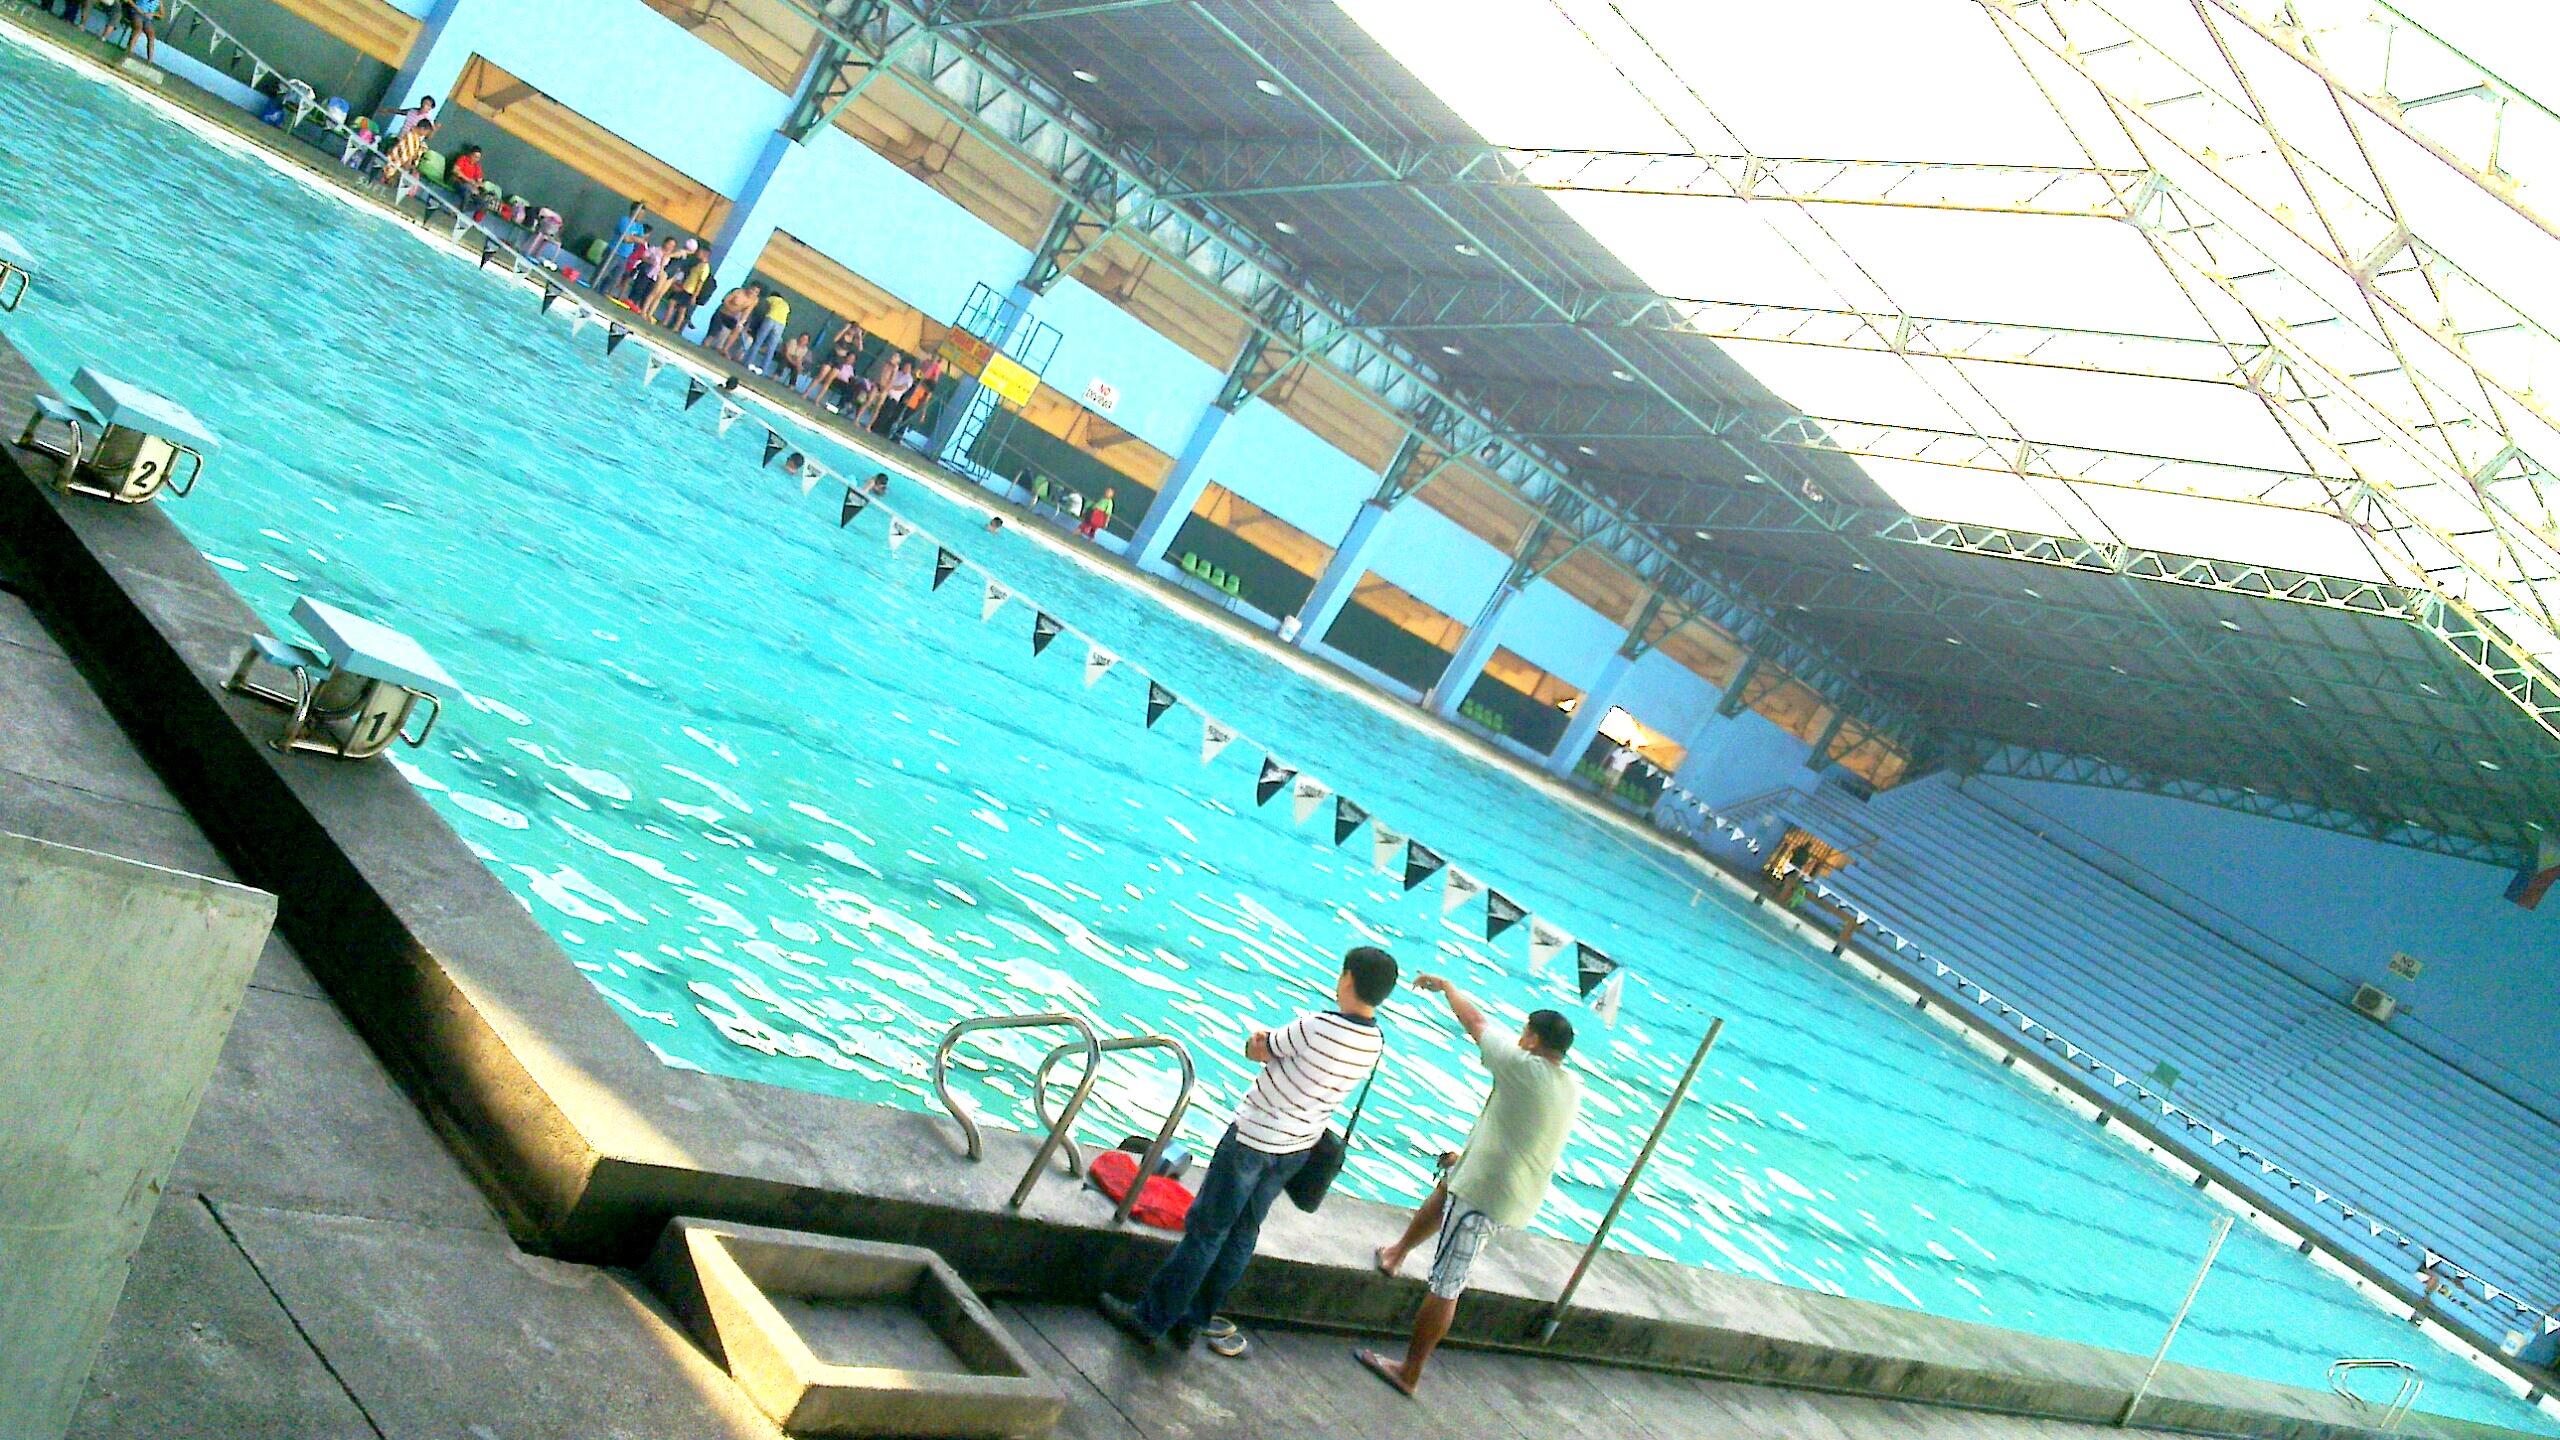 marikina sport center 2 urbandud